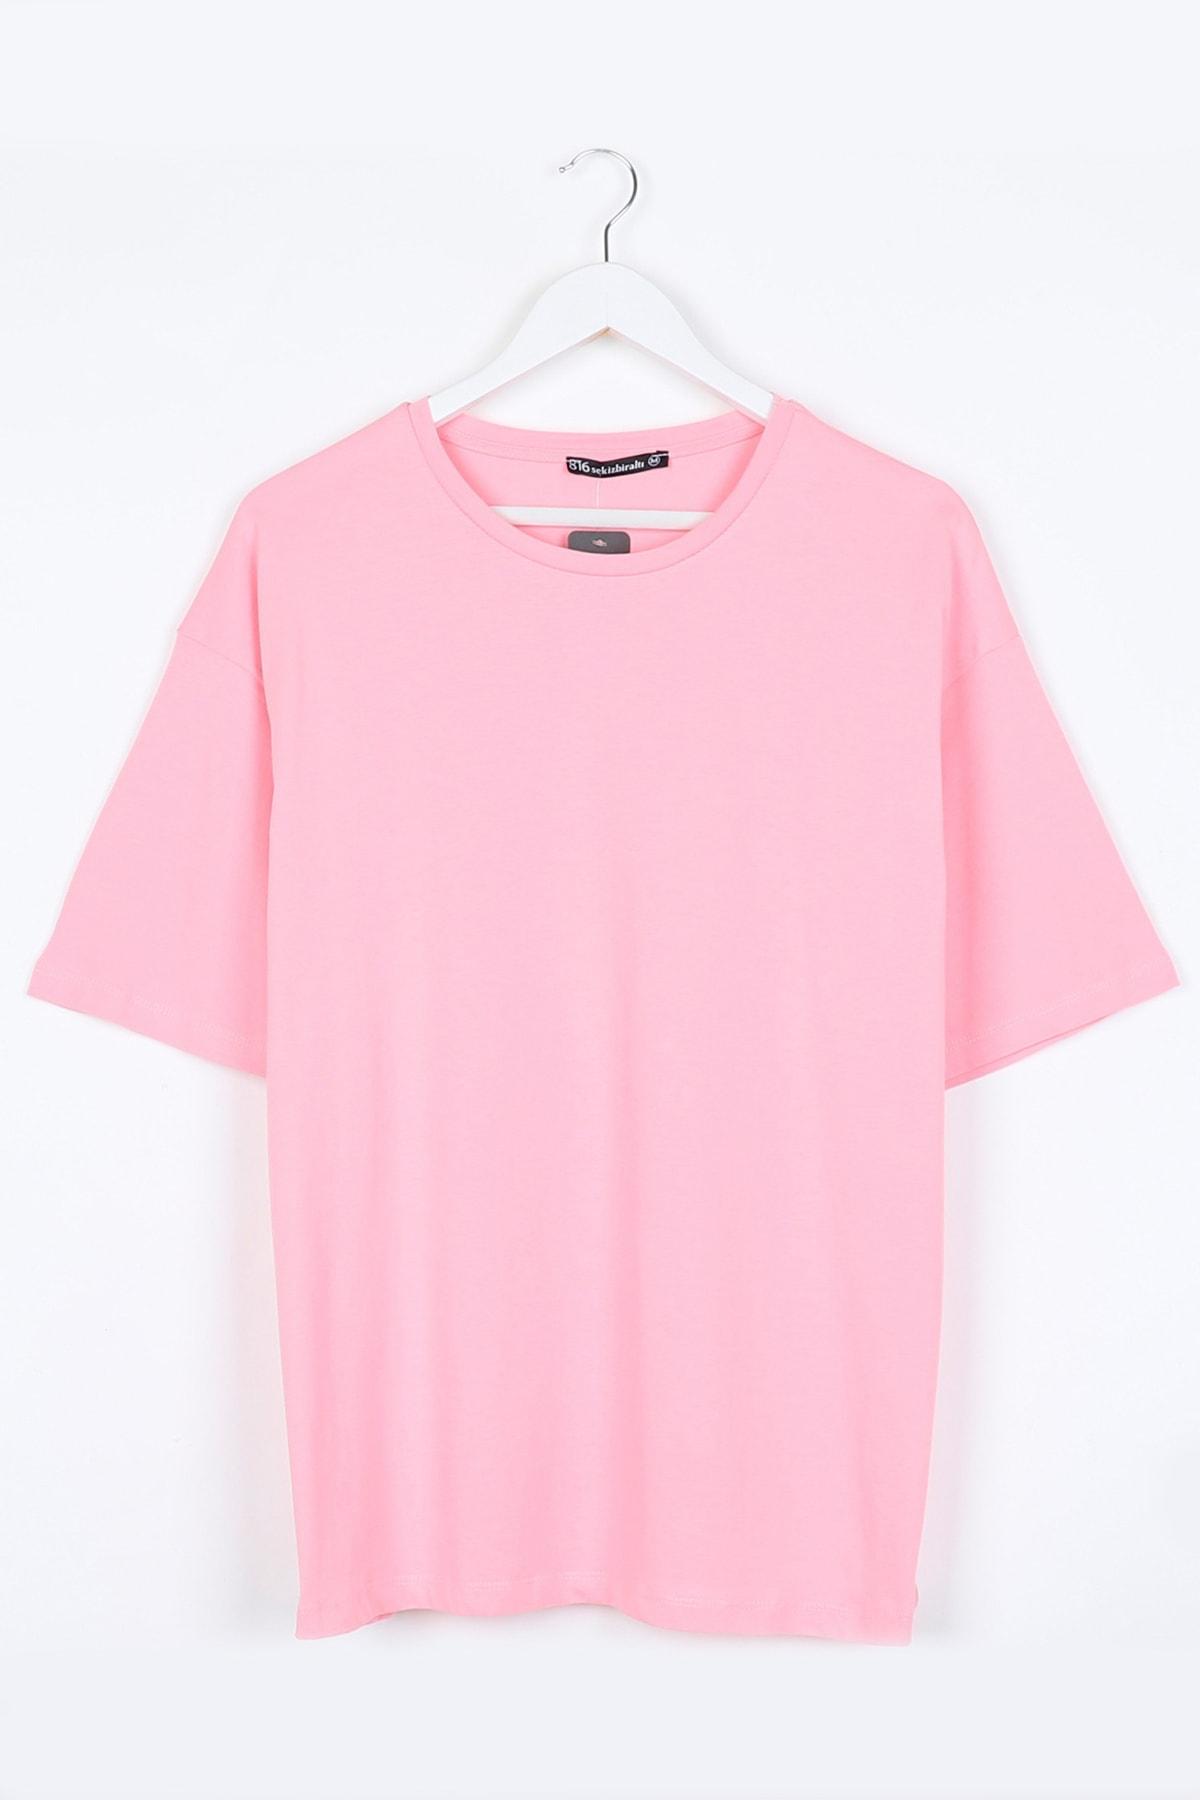 Toz Pembe Kadın Basic Oversize Tshirt